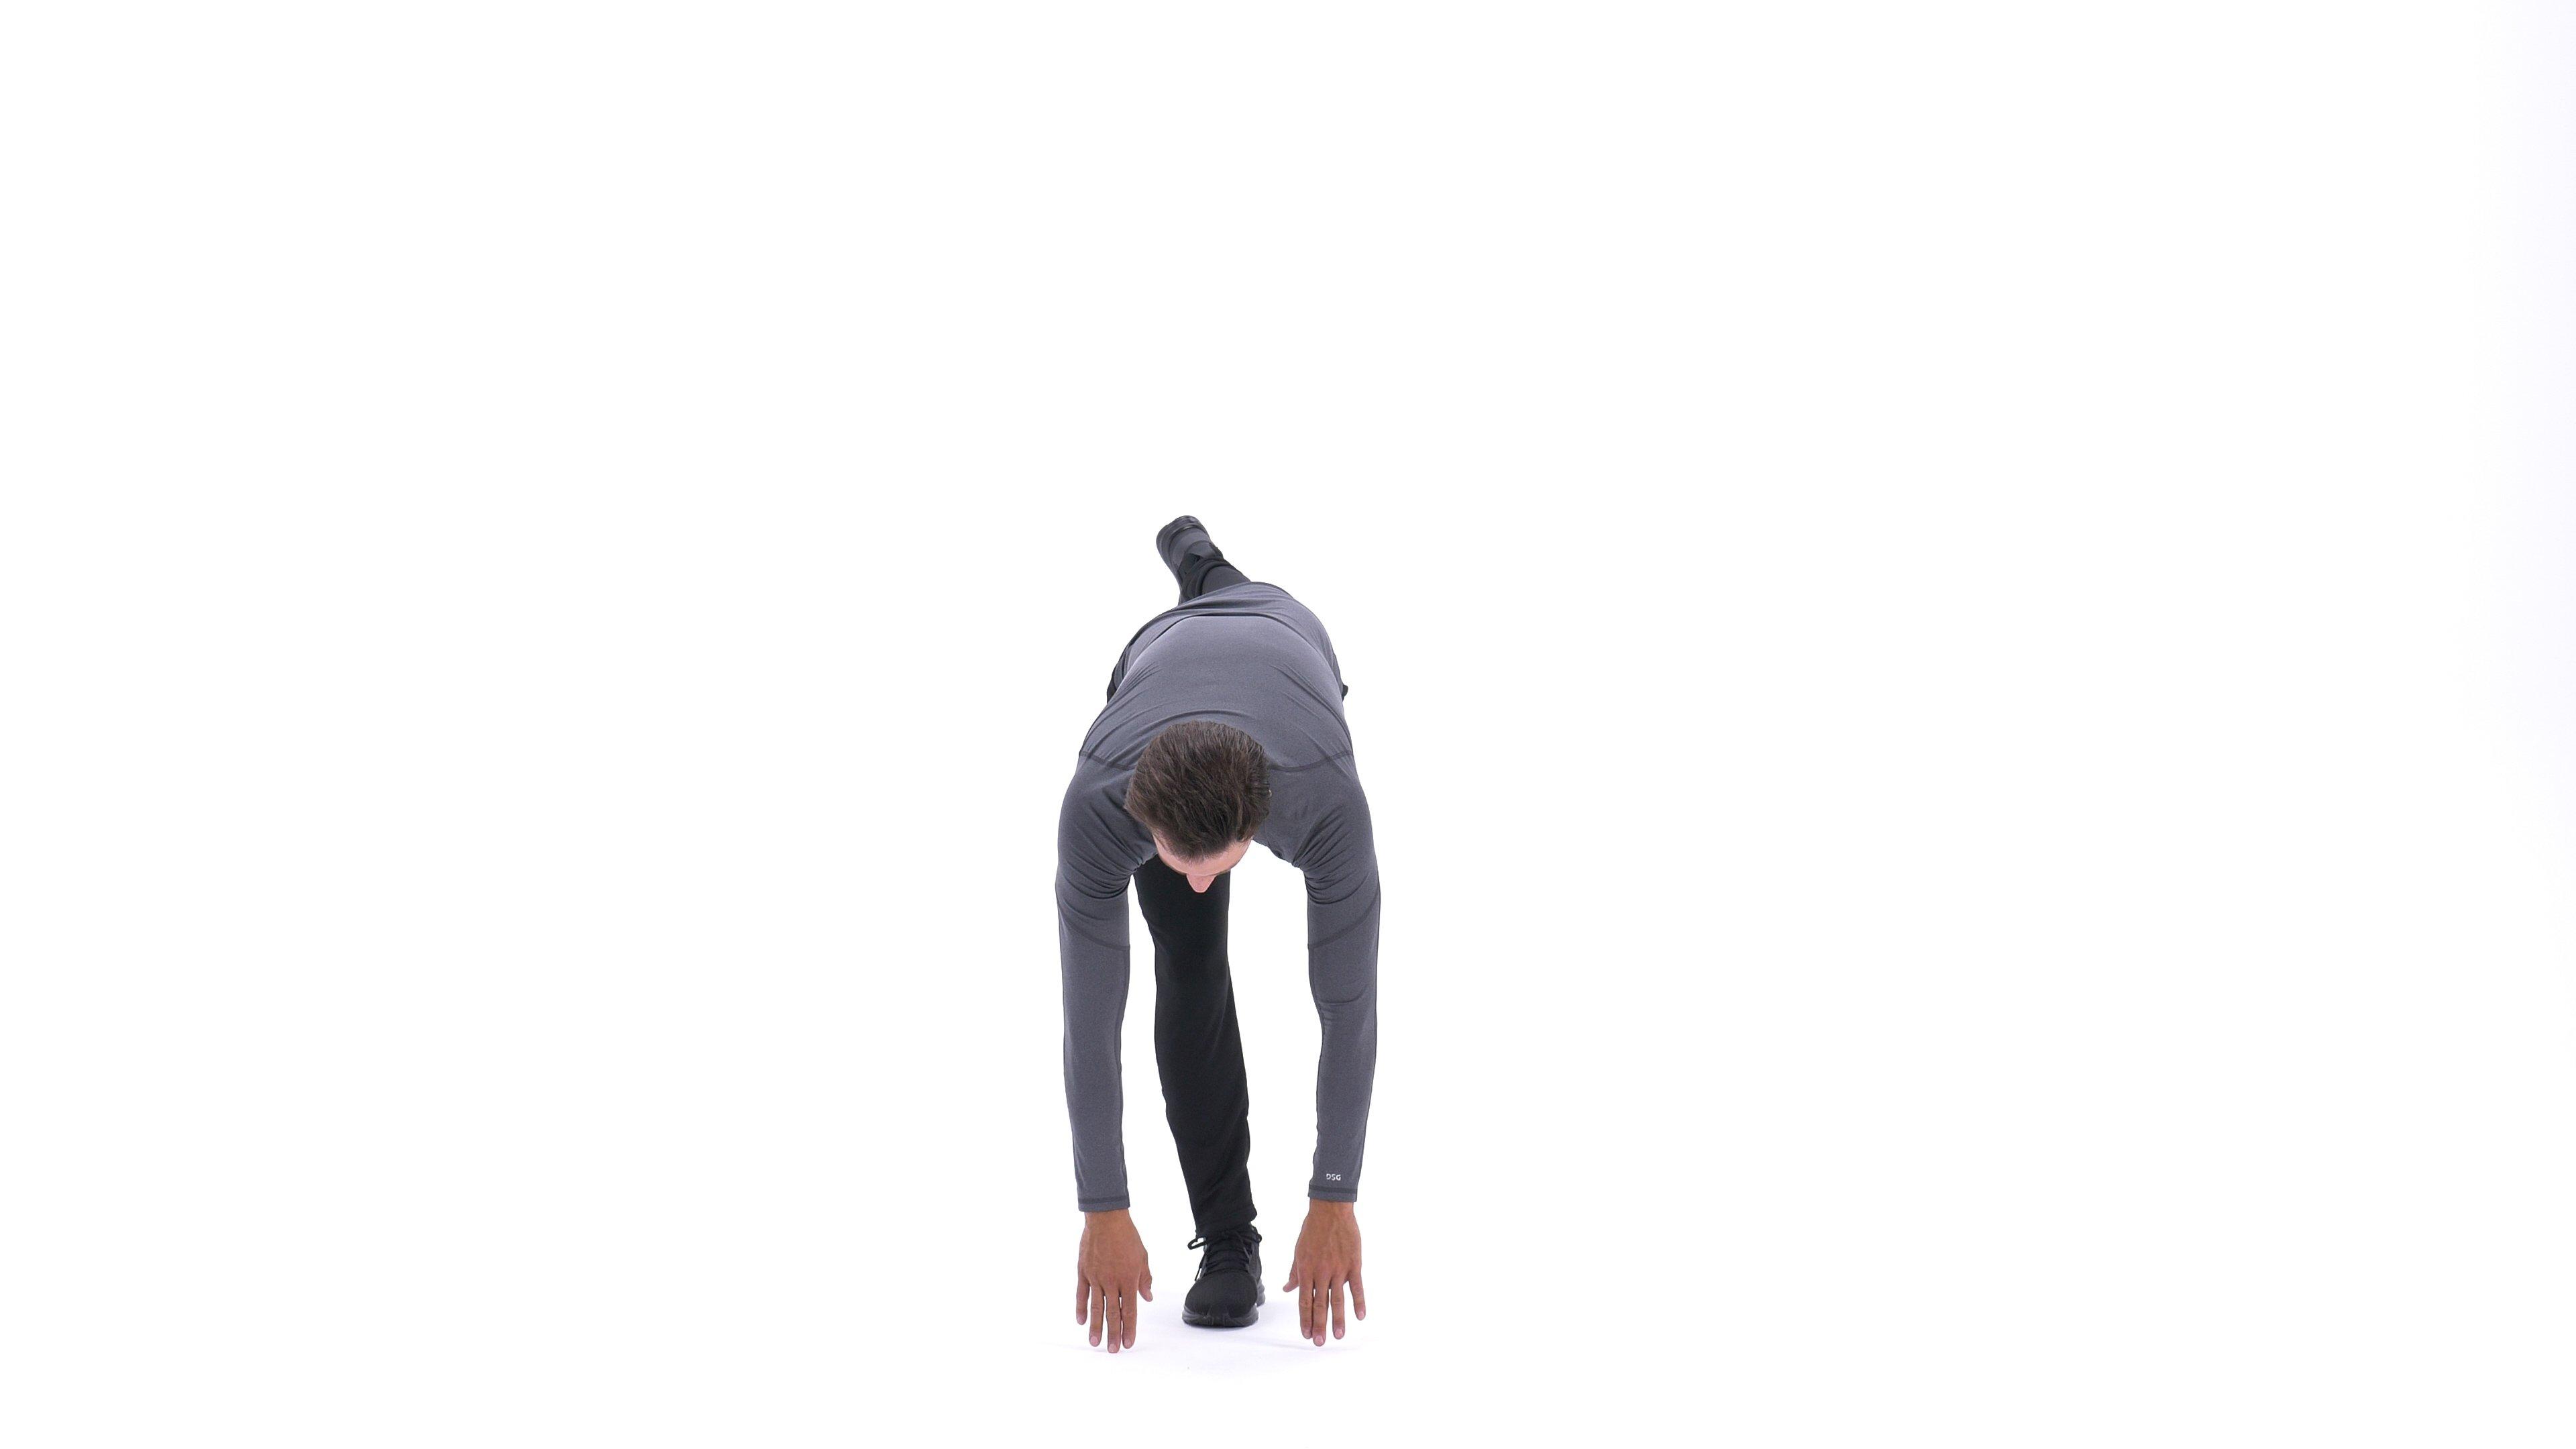 Single-leg balance and reach image